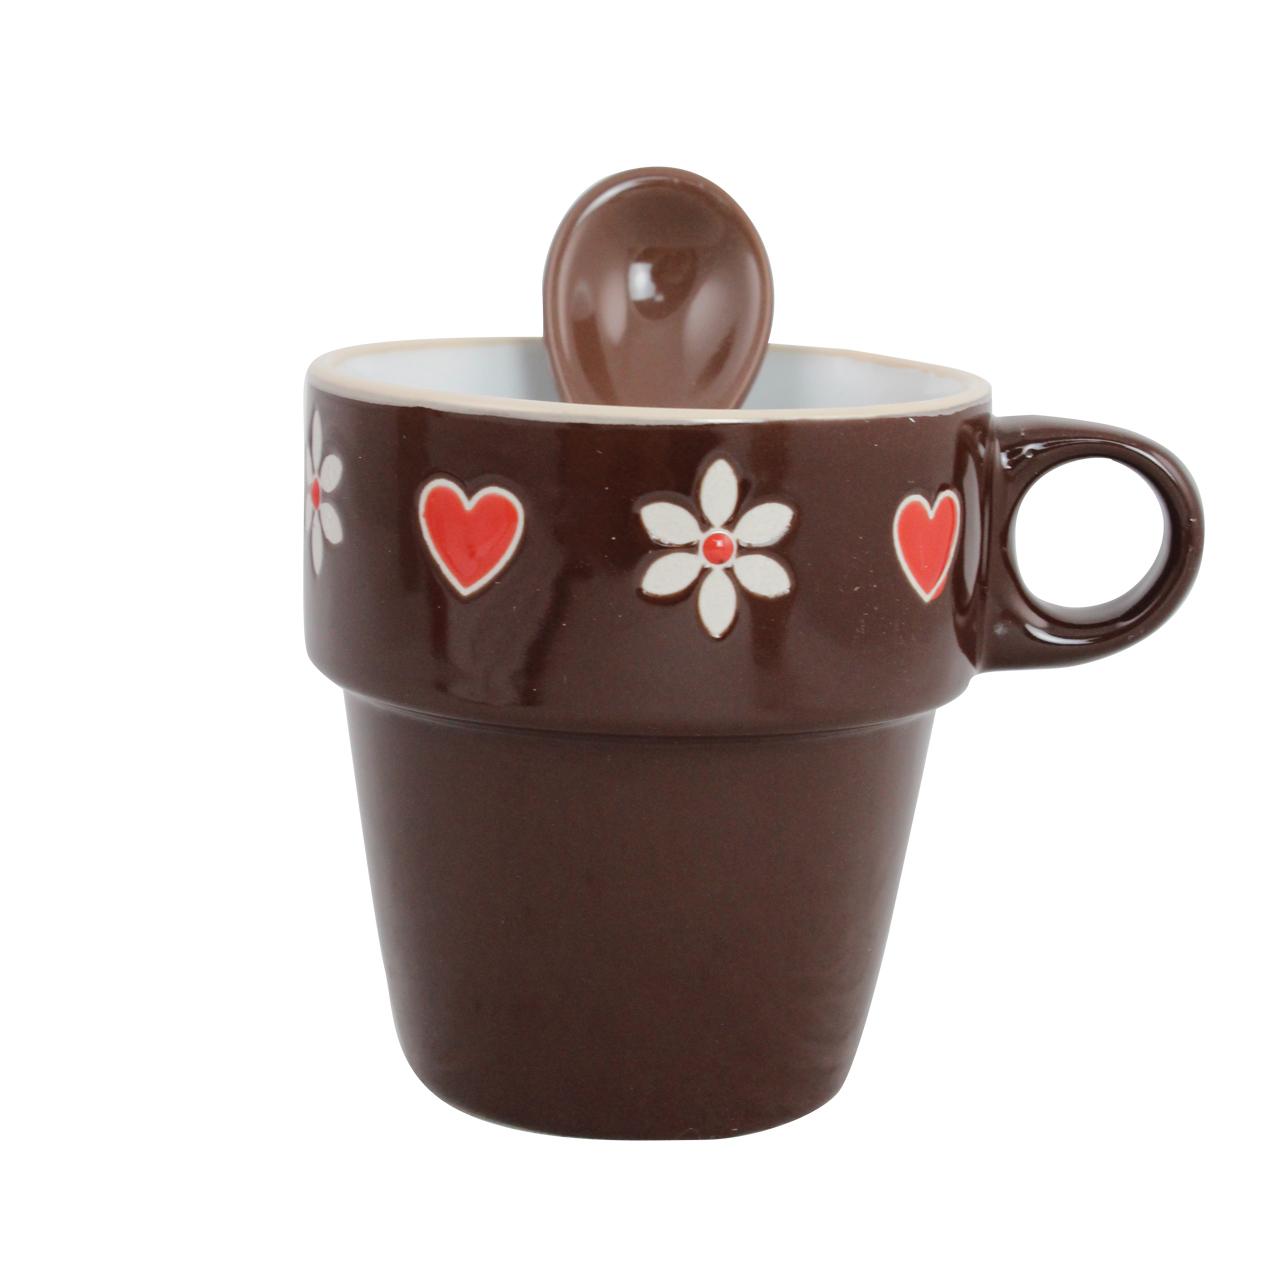 Cana Cu Lingurita Din Ceramica Maro 6 Cm